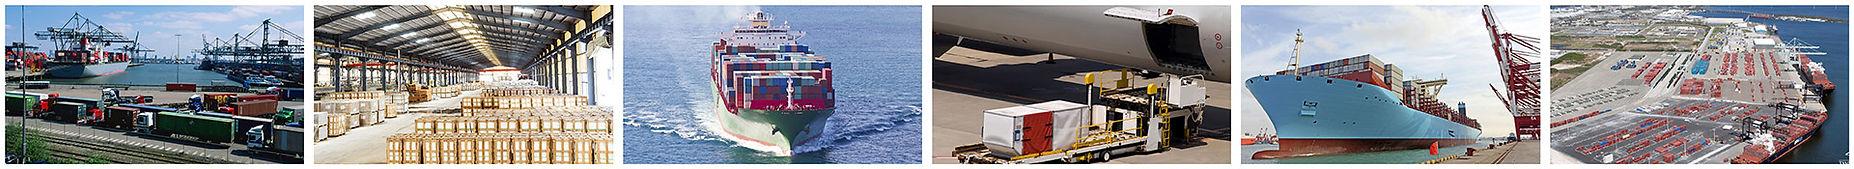 logistics-services.jpg